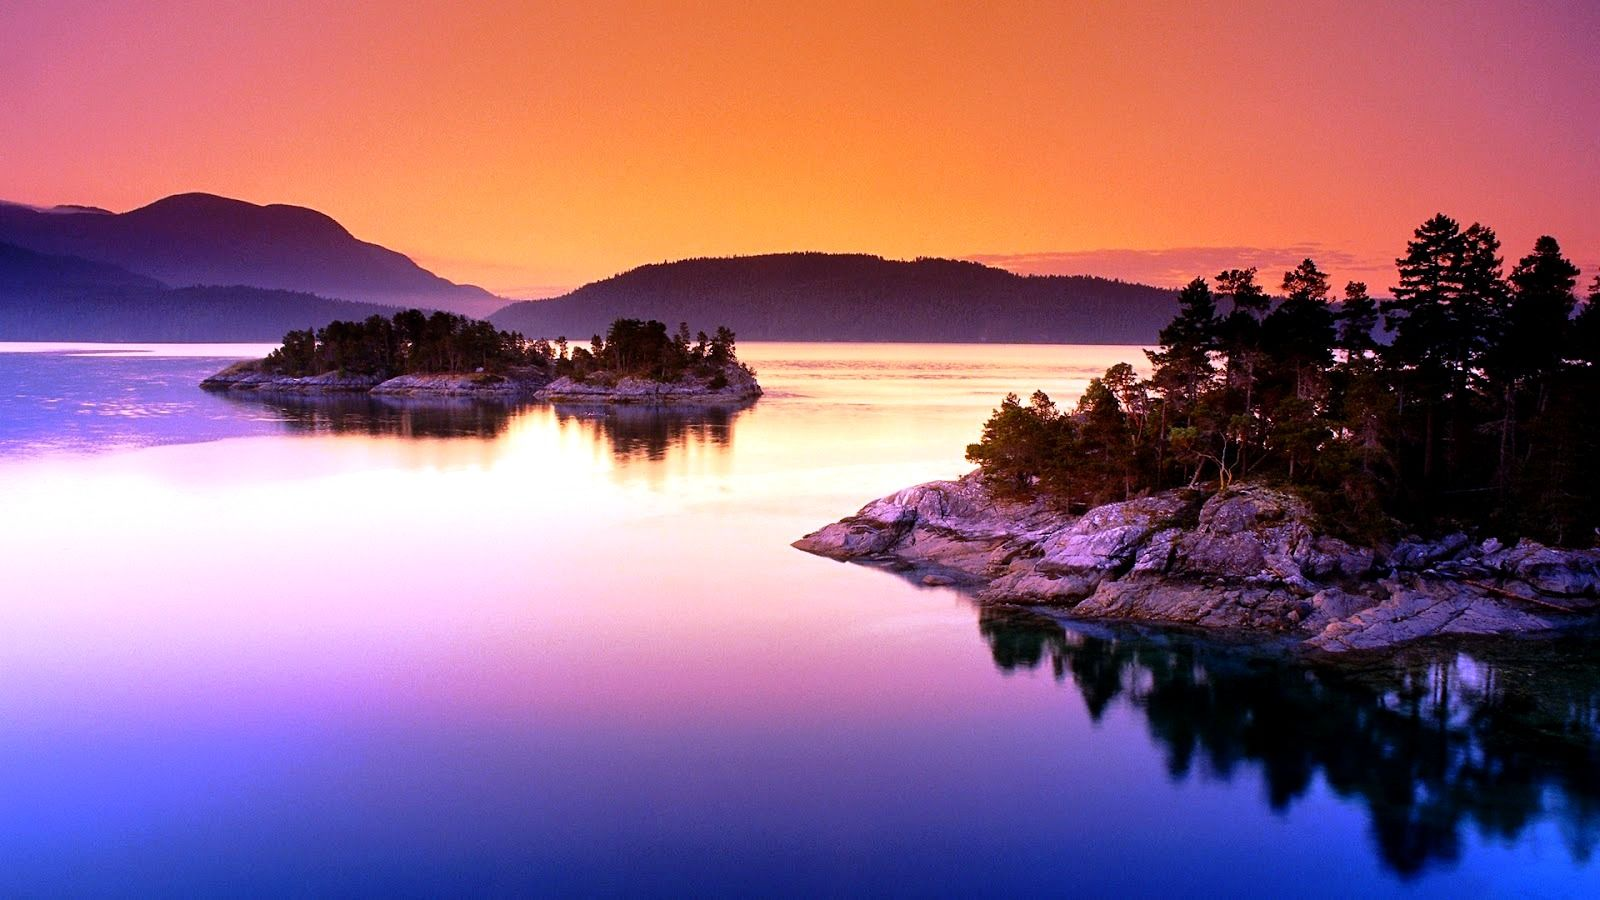 Pretty Landscape Wallpapers Top Free Pretty Landscape